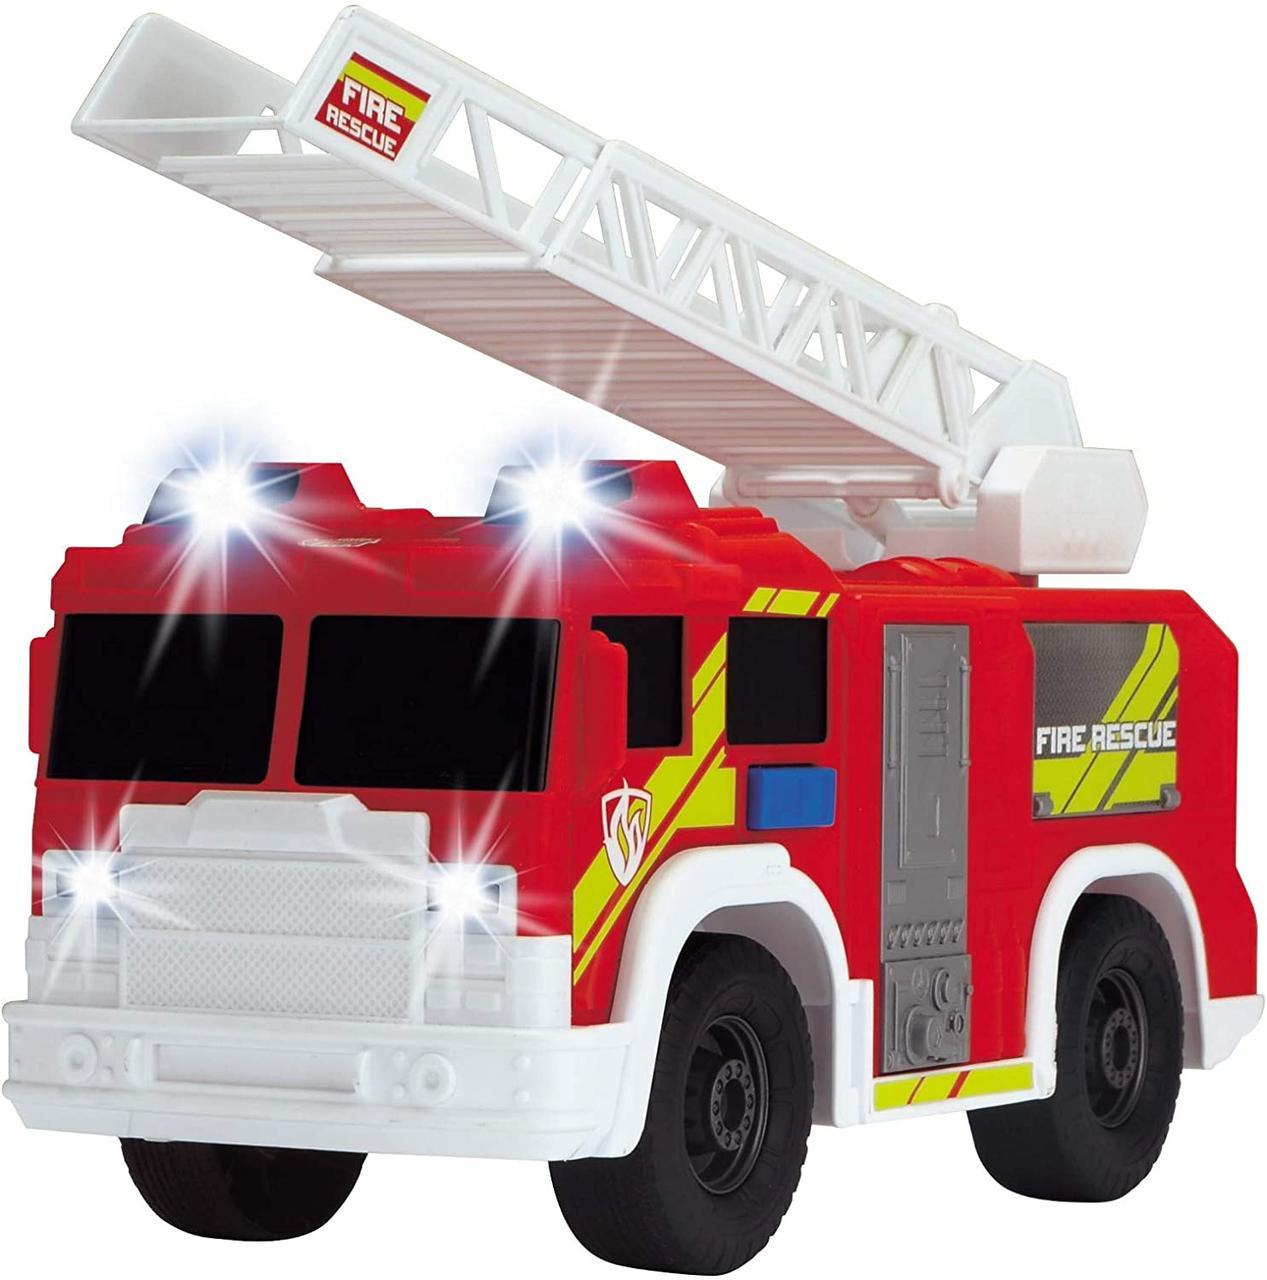 Функциональная машина Пожарная служба, 30 см, Dickie Toys 3306000